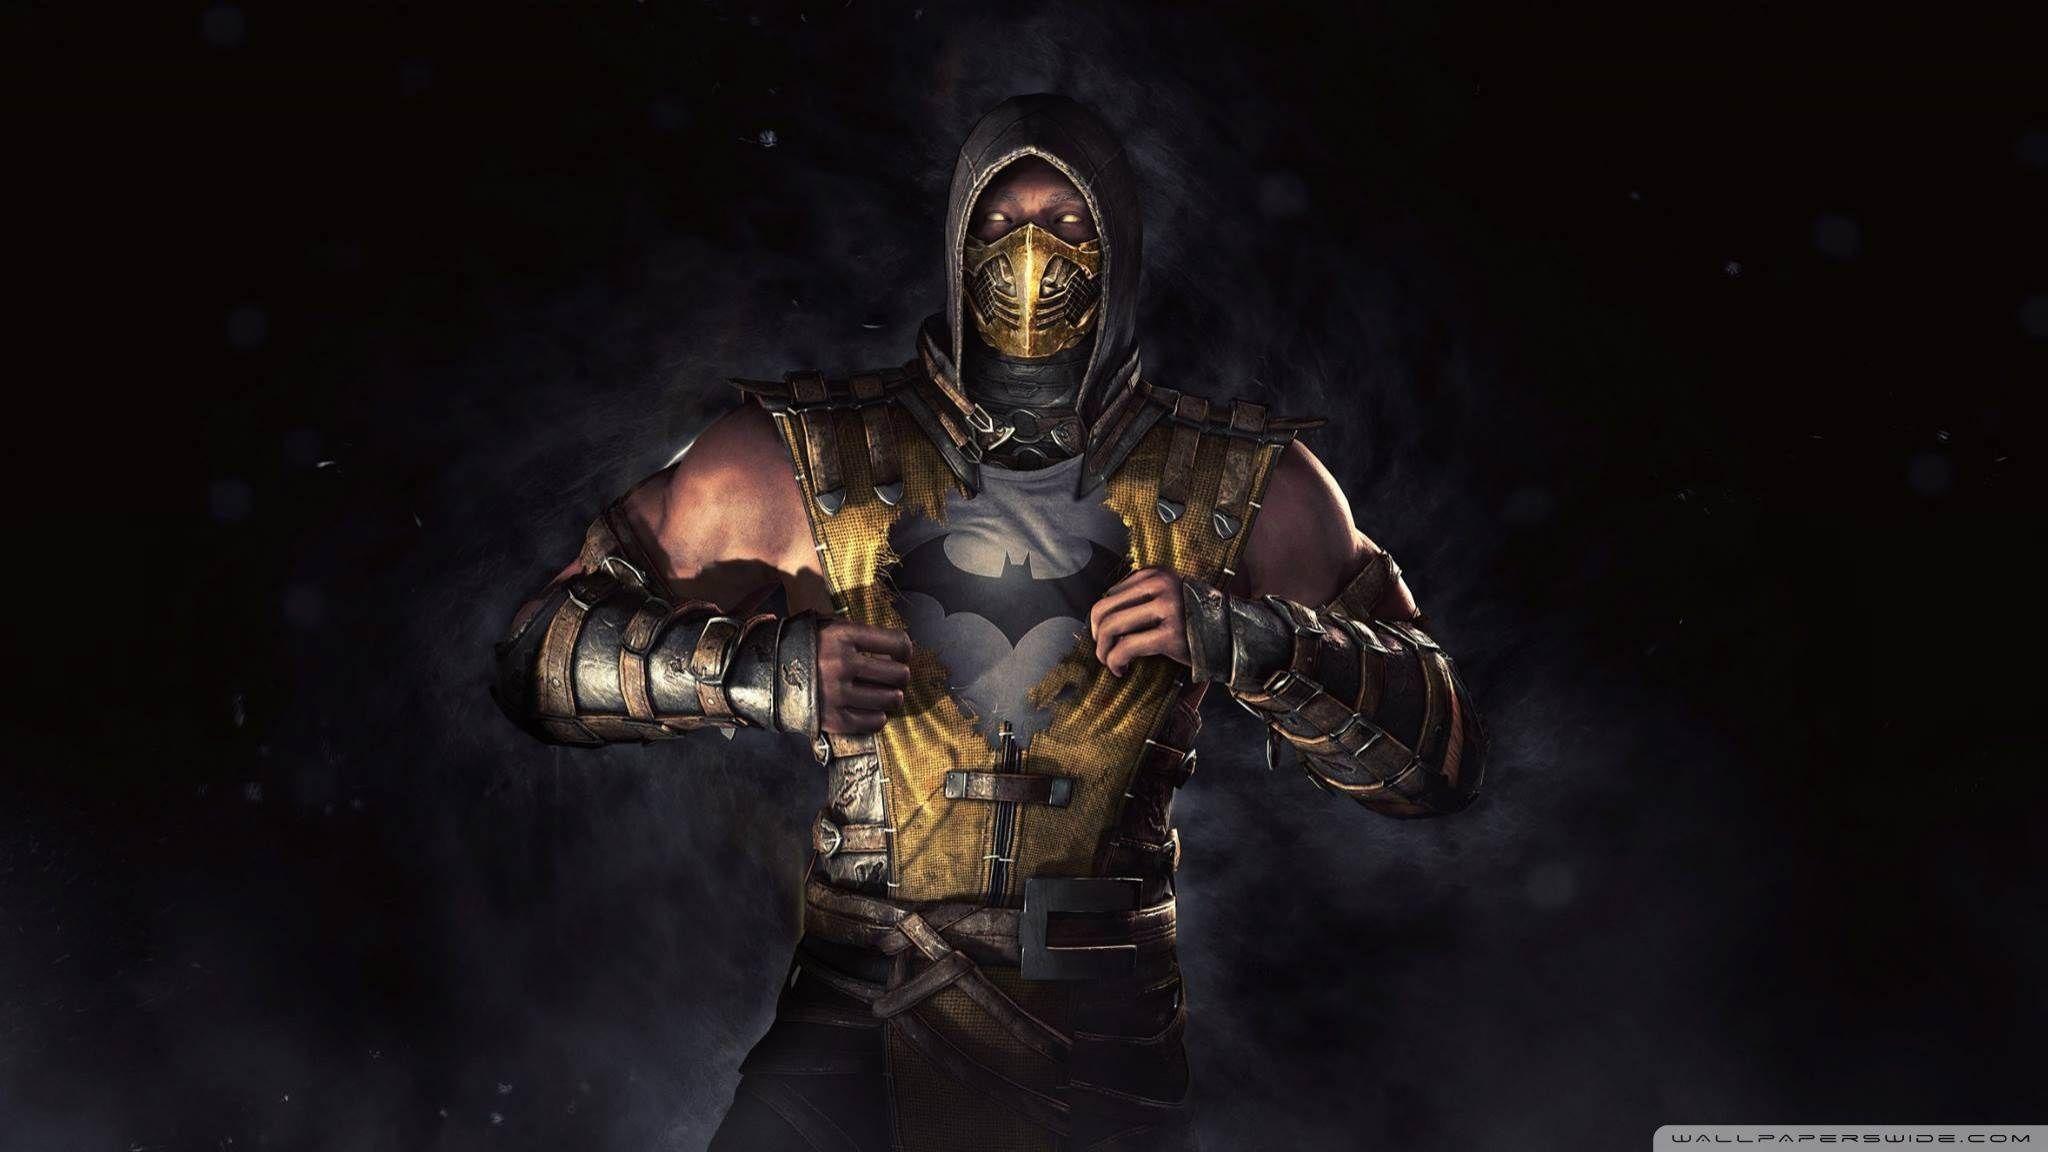 Mortal Kombat Scorpion Hd Desktop Wallpaper High Definition 2048